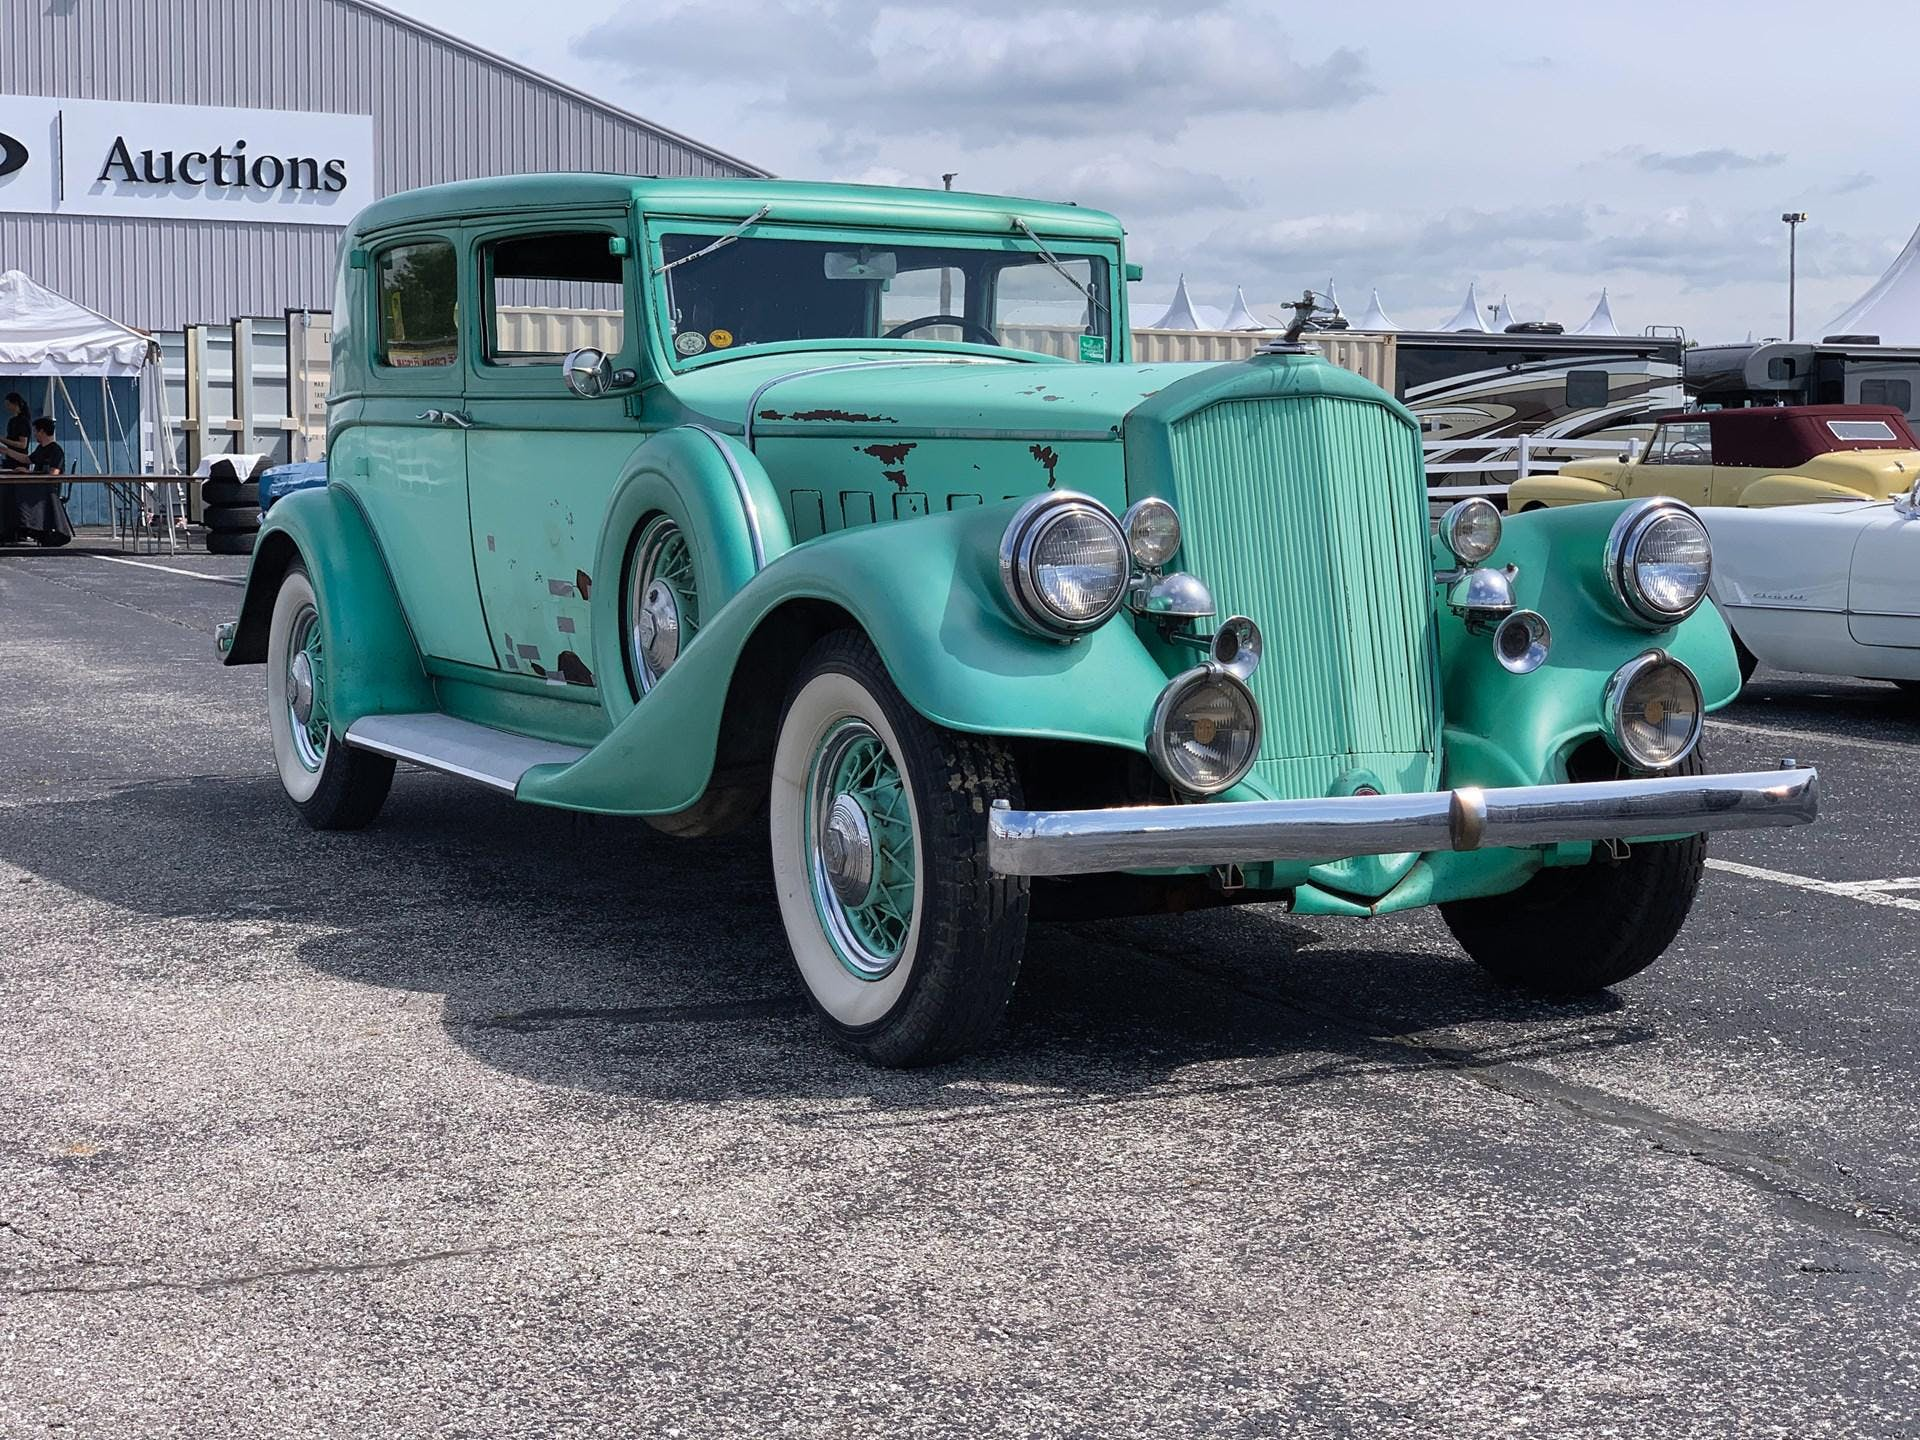 1933 Pierce-Arrow 8 Sedan